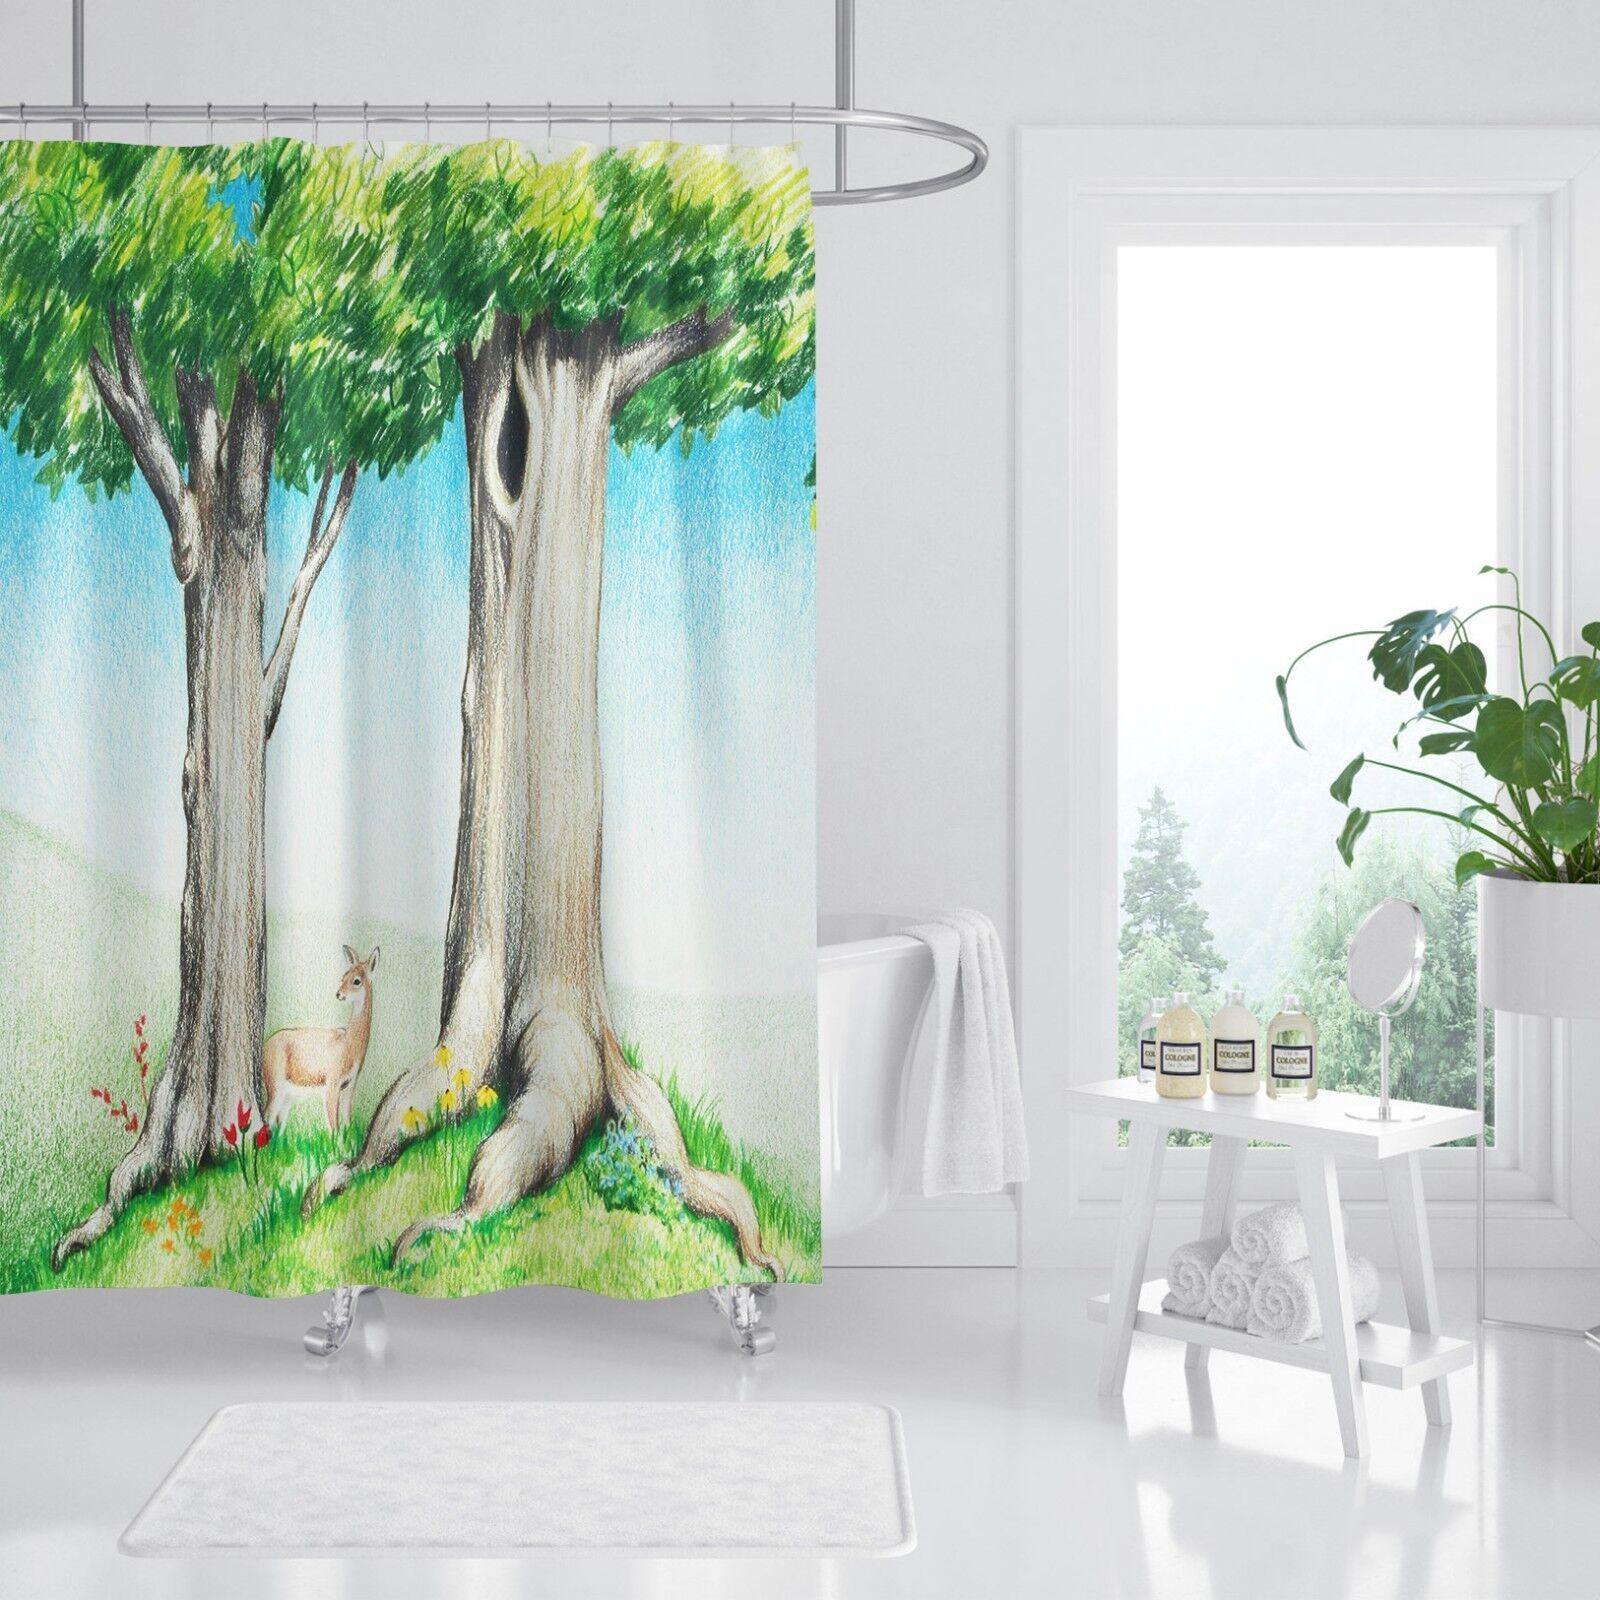 3D CKunstoon Tree 14 Shower Curtain Waterproof Fiber Bathroom Home Windows Toilet